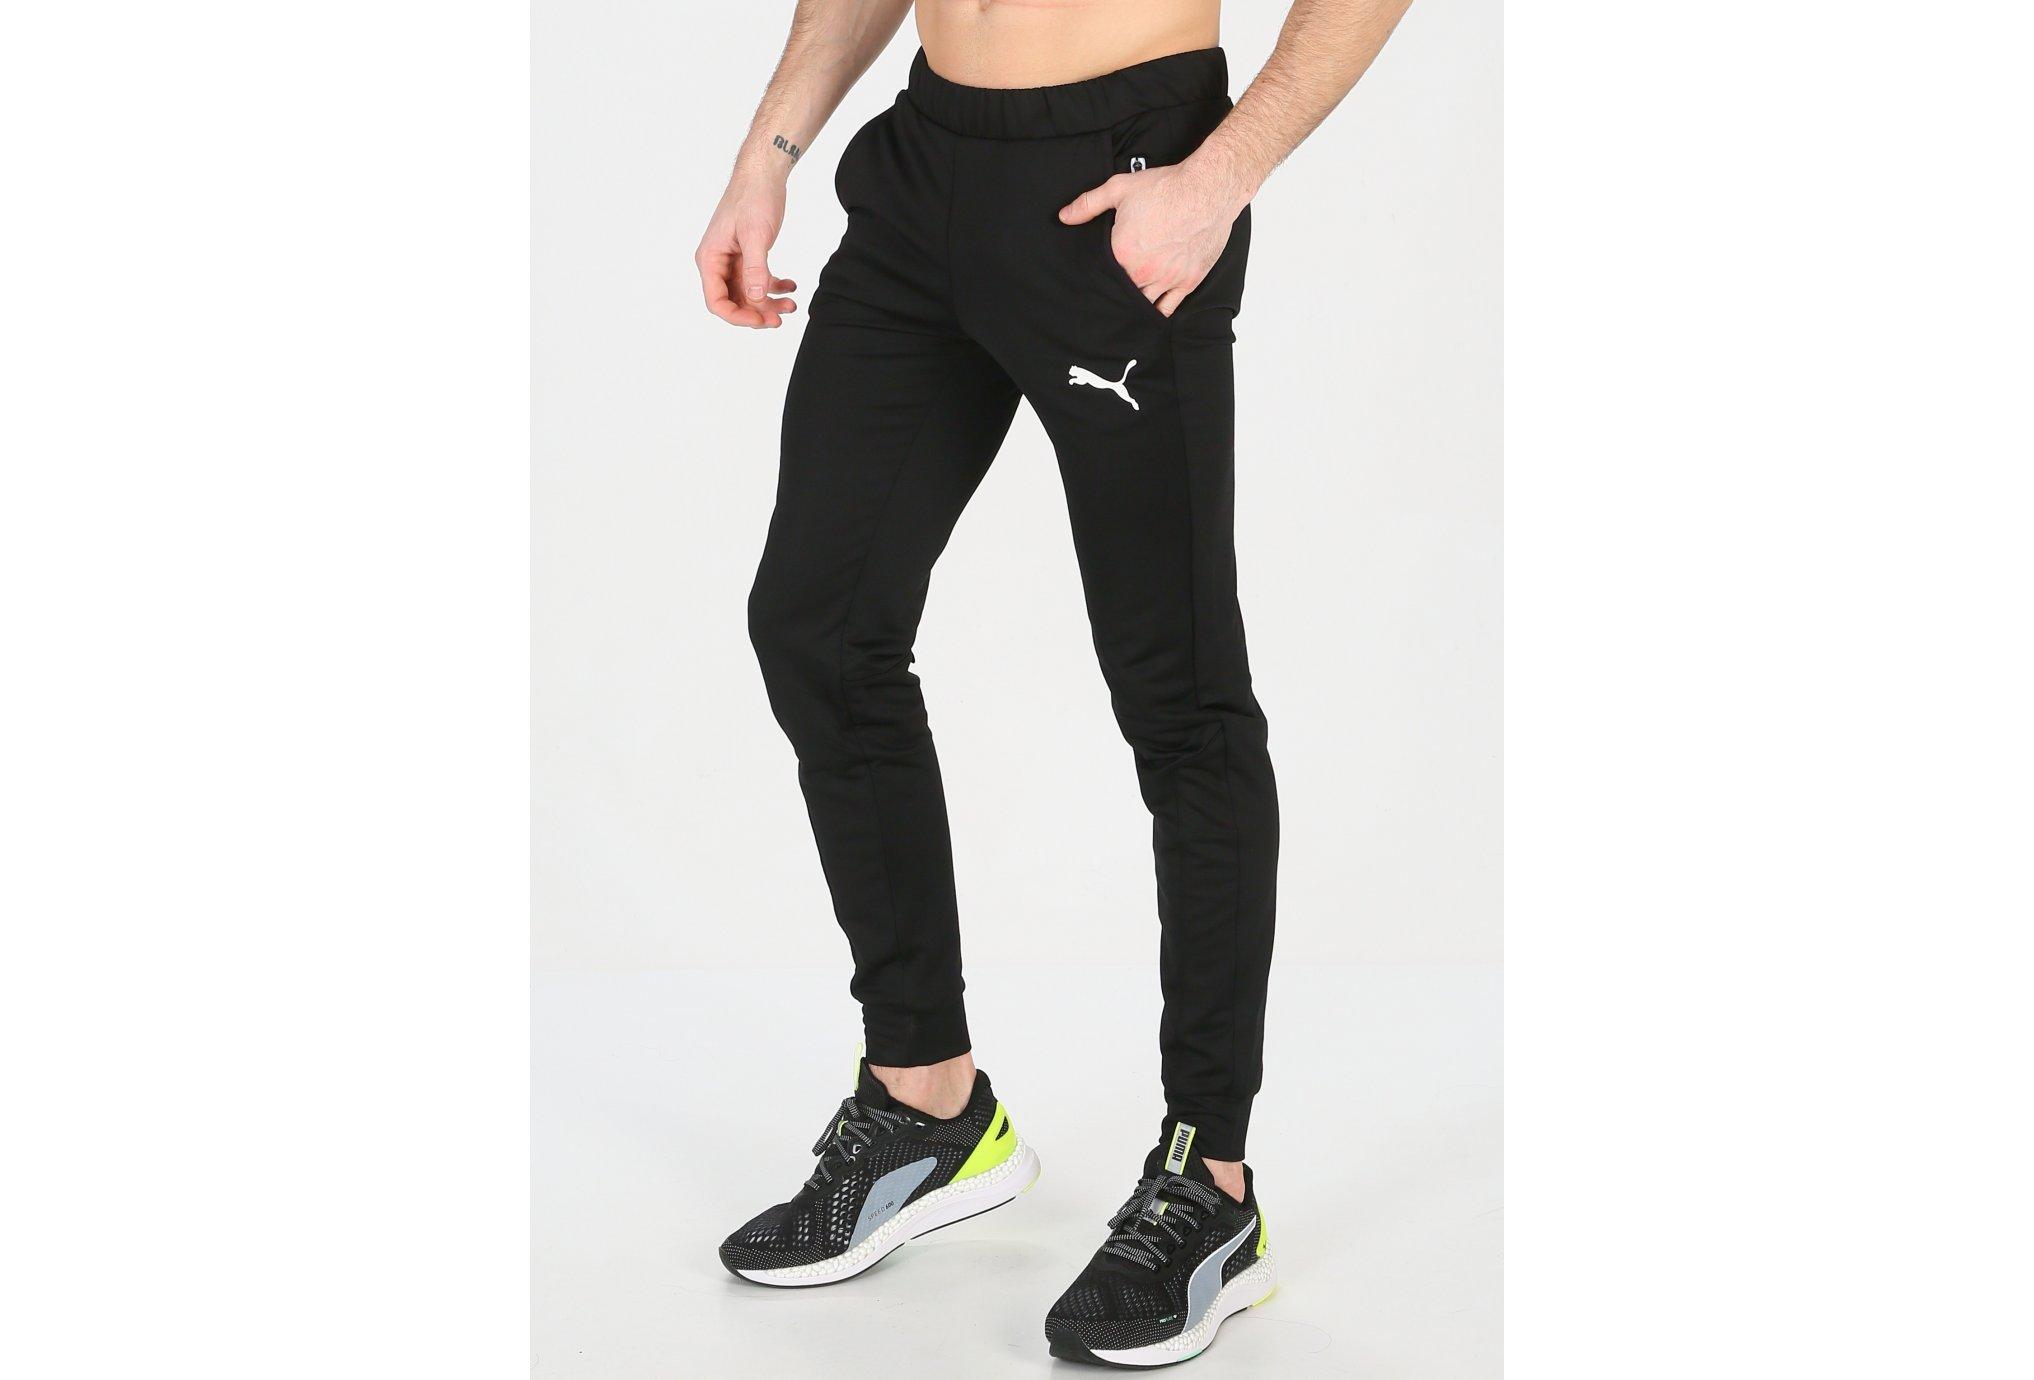 Puma Ready To Go Knit M vêtement running homme